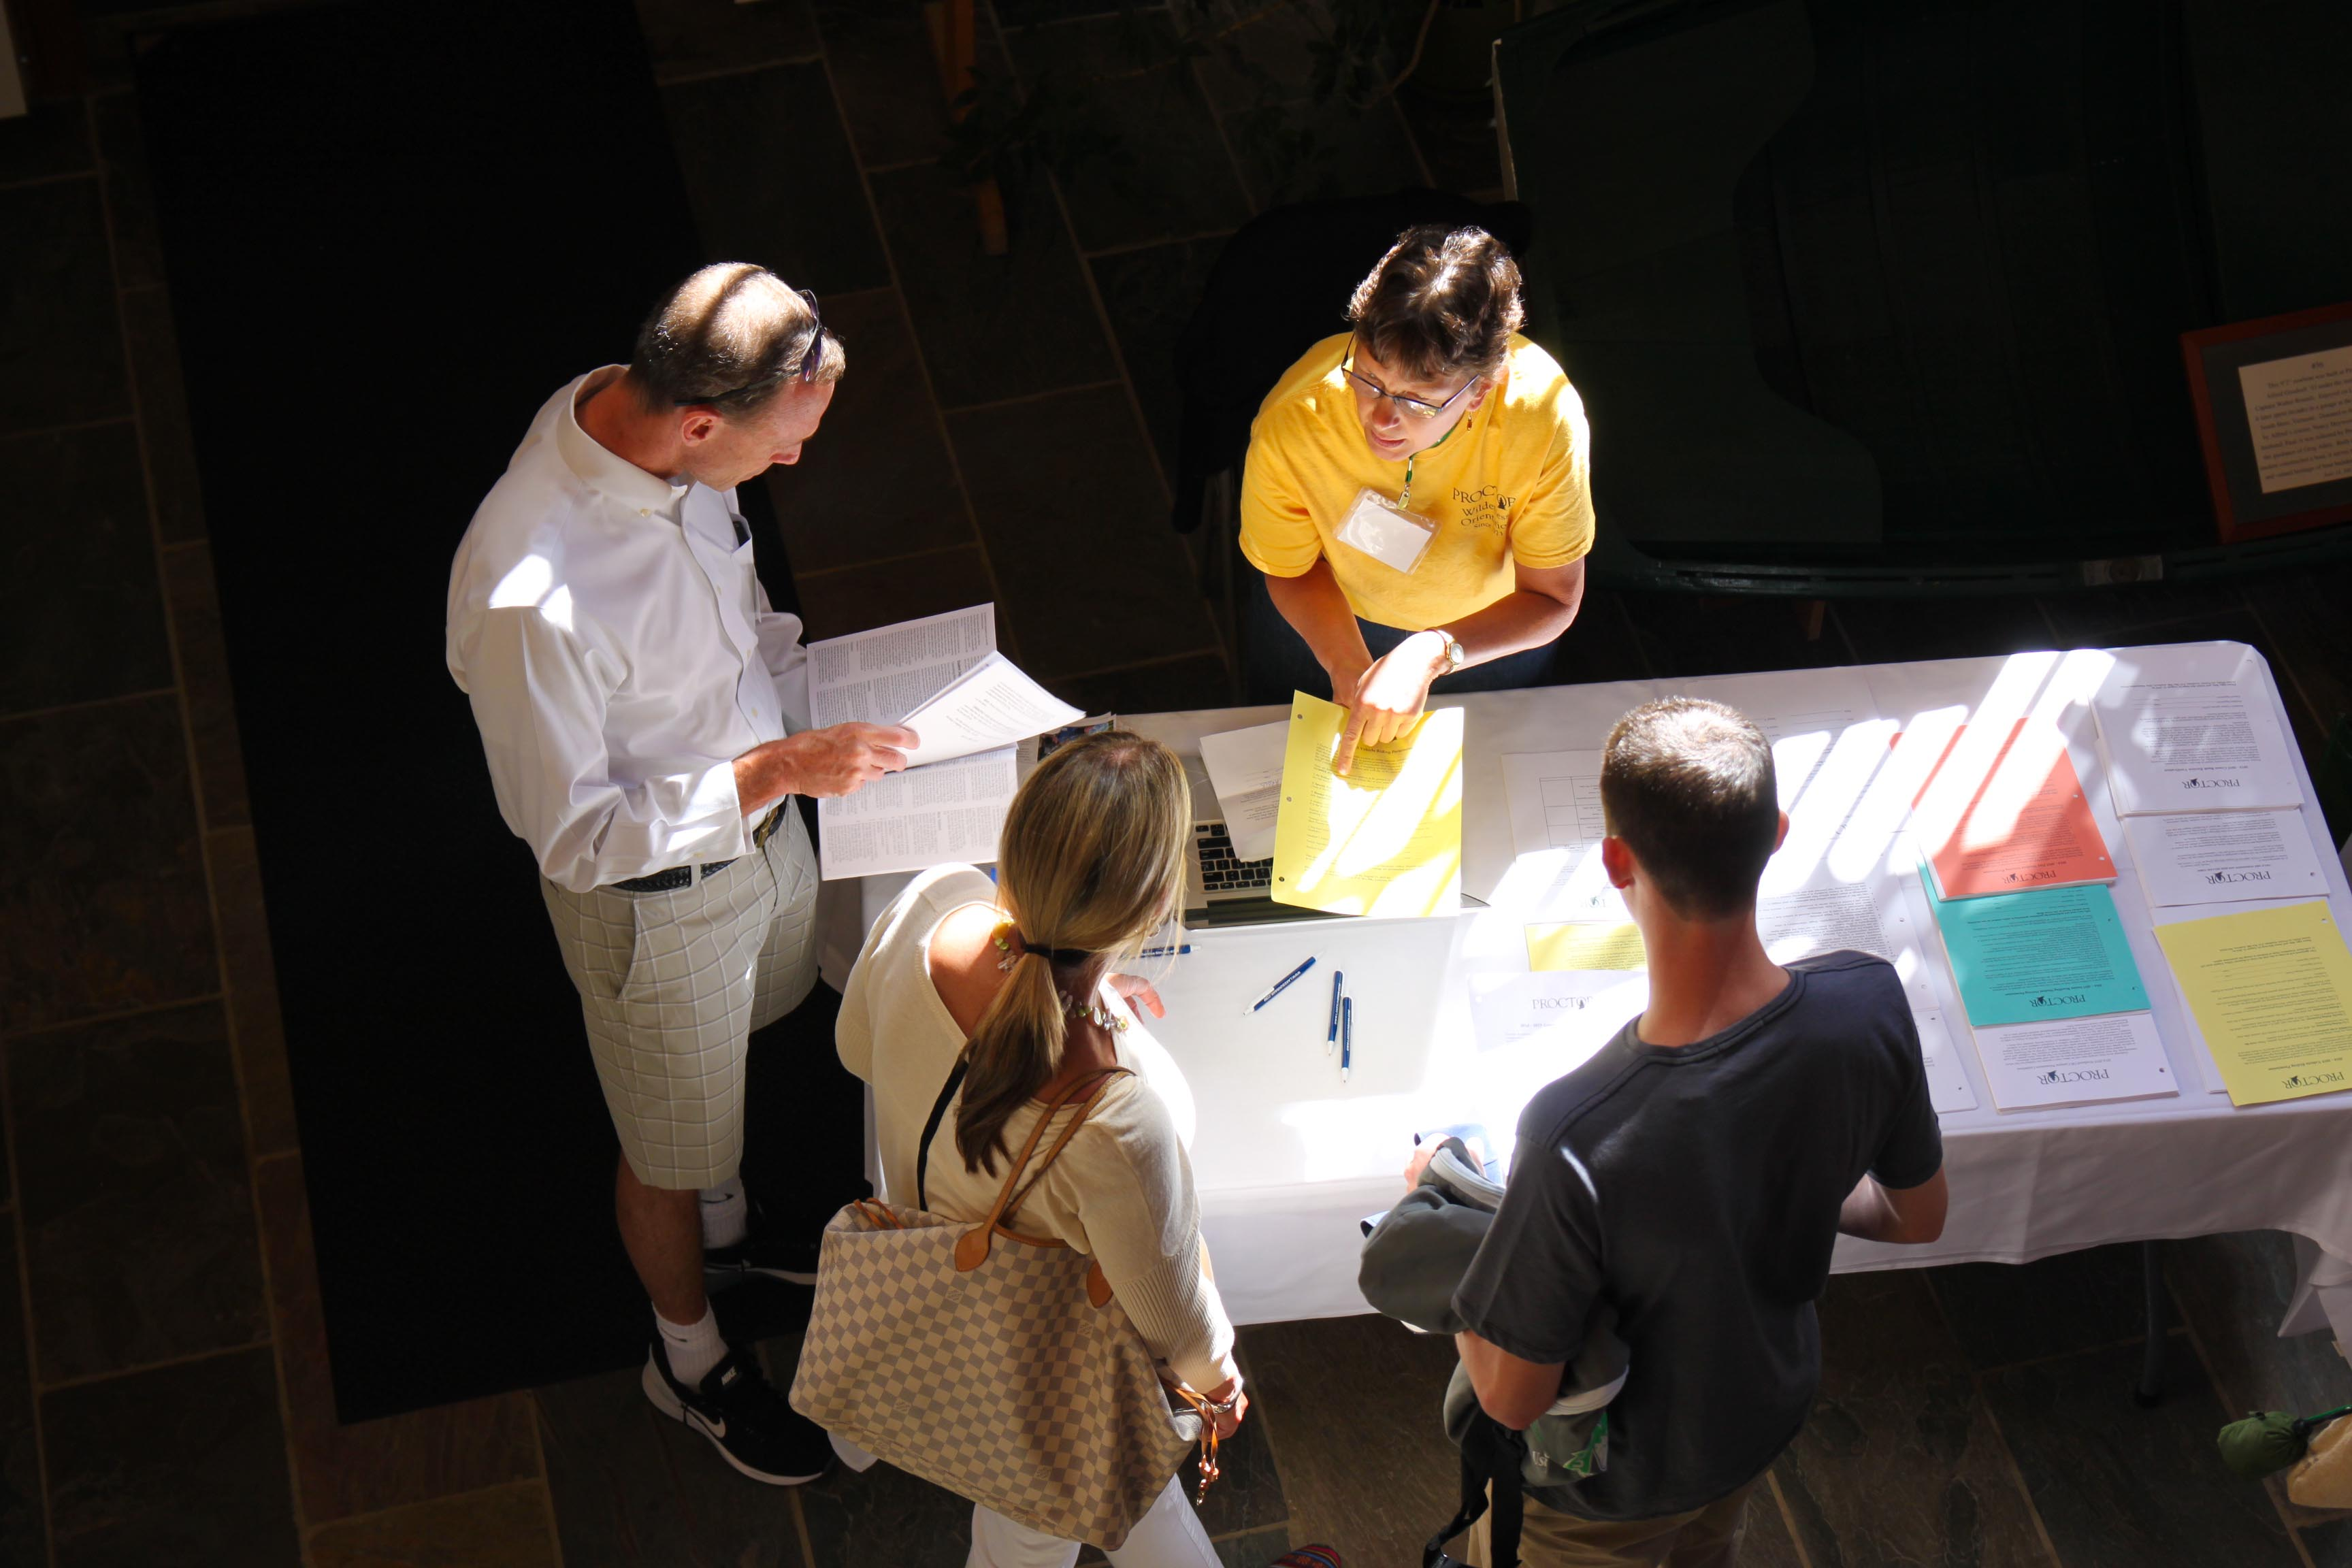 Proctor Academy Registration Day 2014